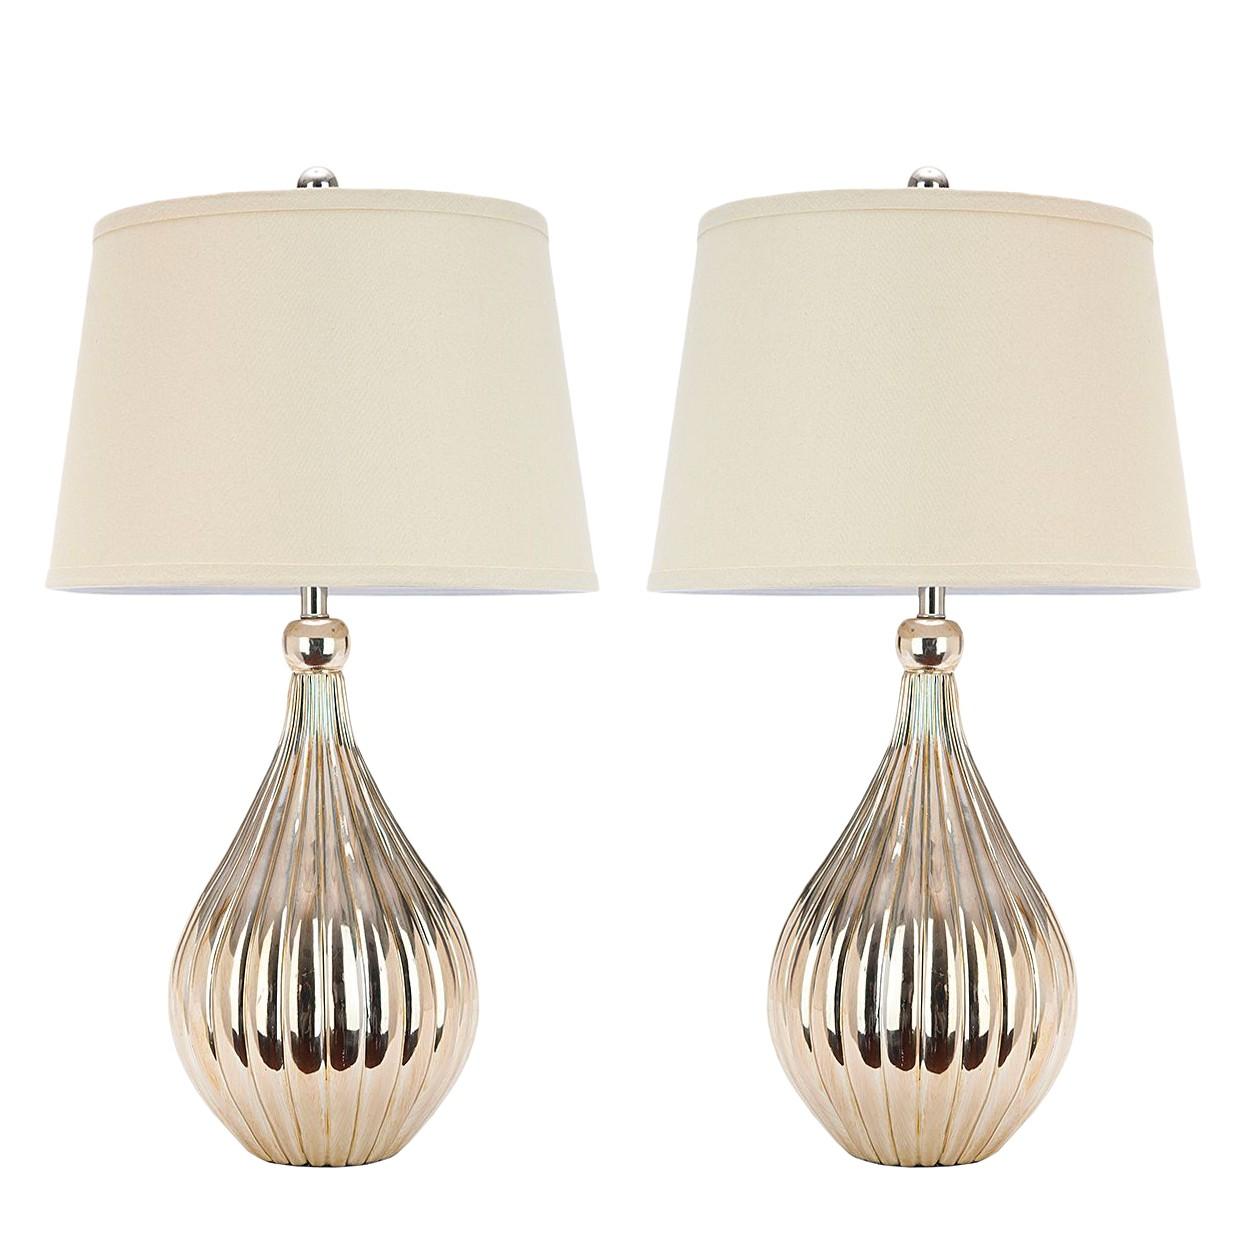 Lampe de table Elli (lot de 2)